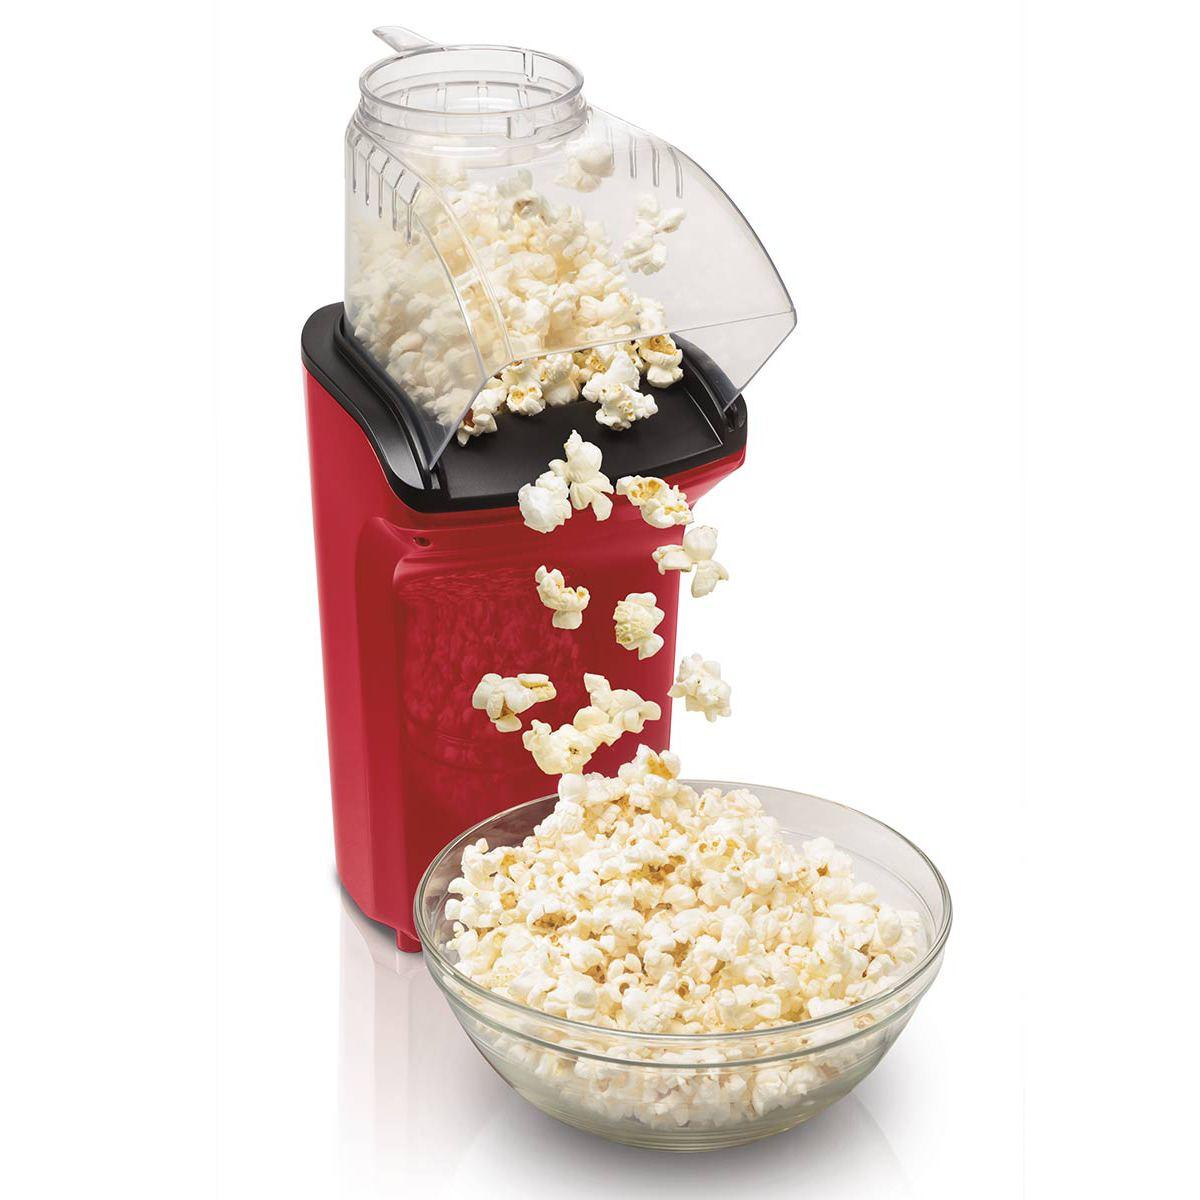 Hamilton Beach Hot Air Popcorn Popper 73400